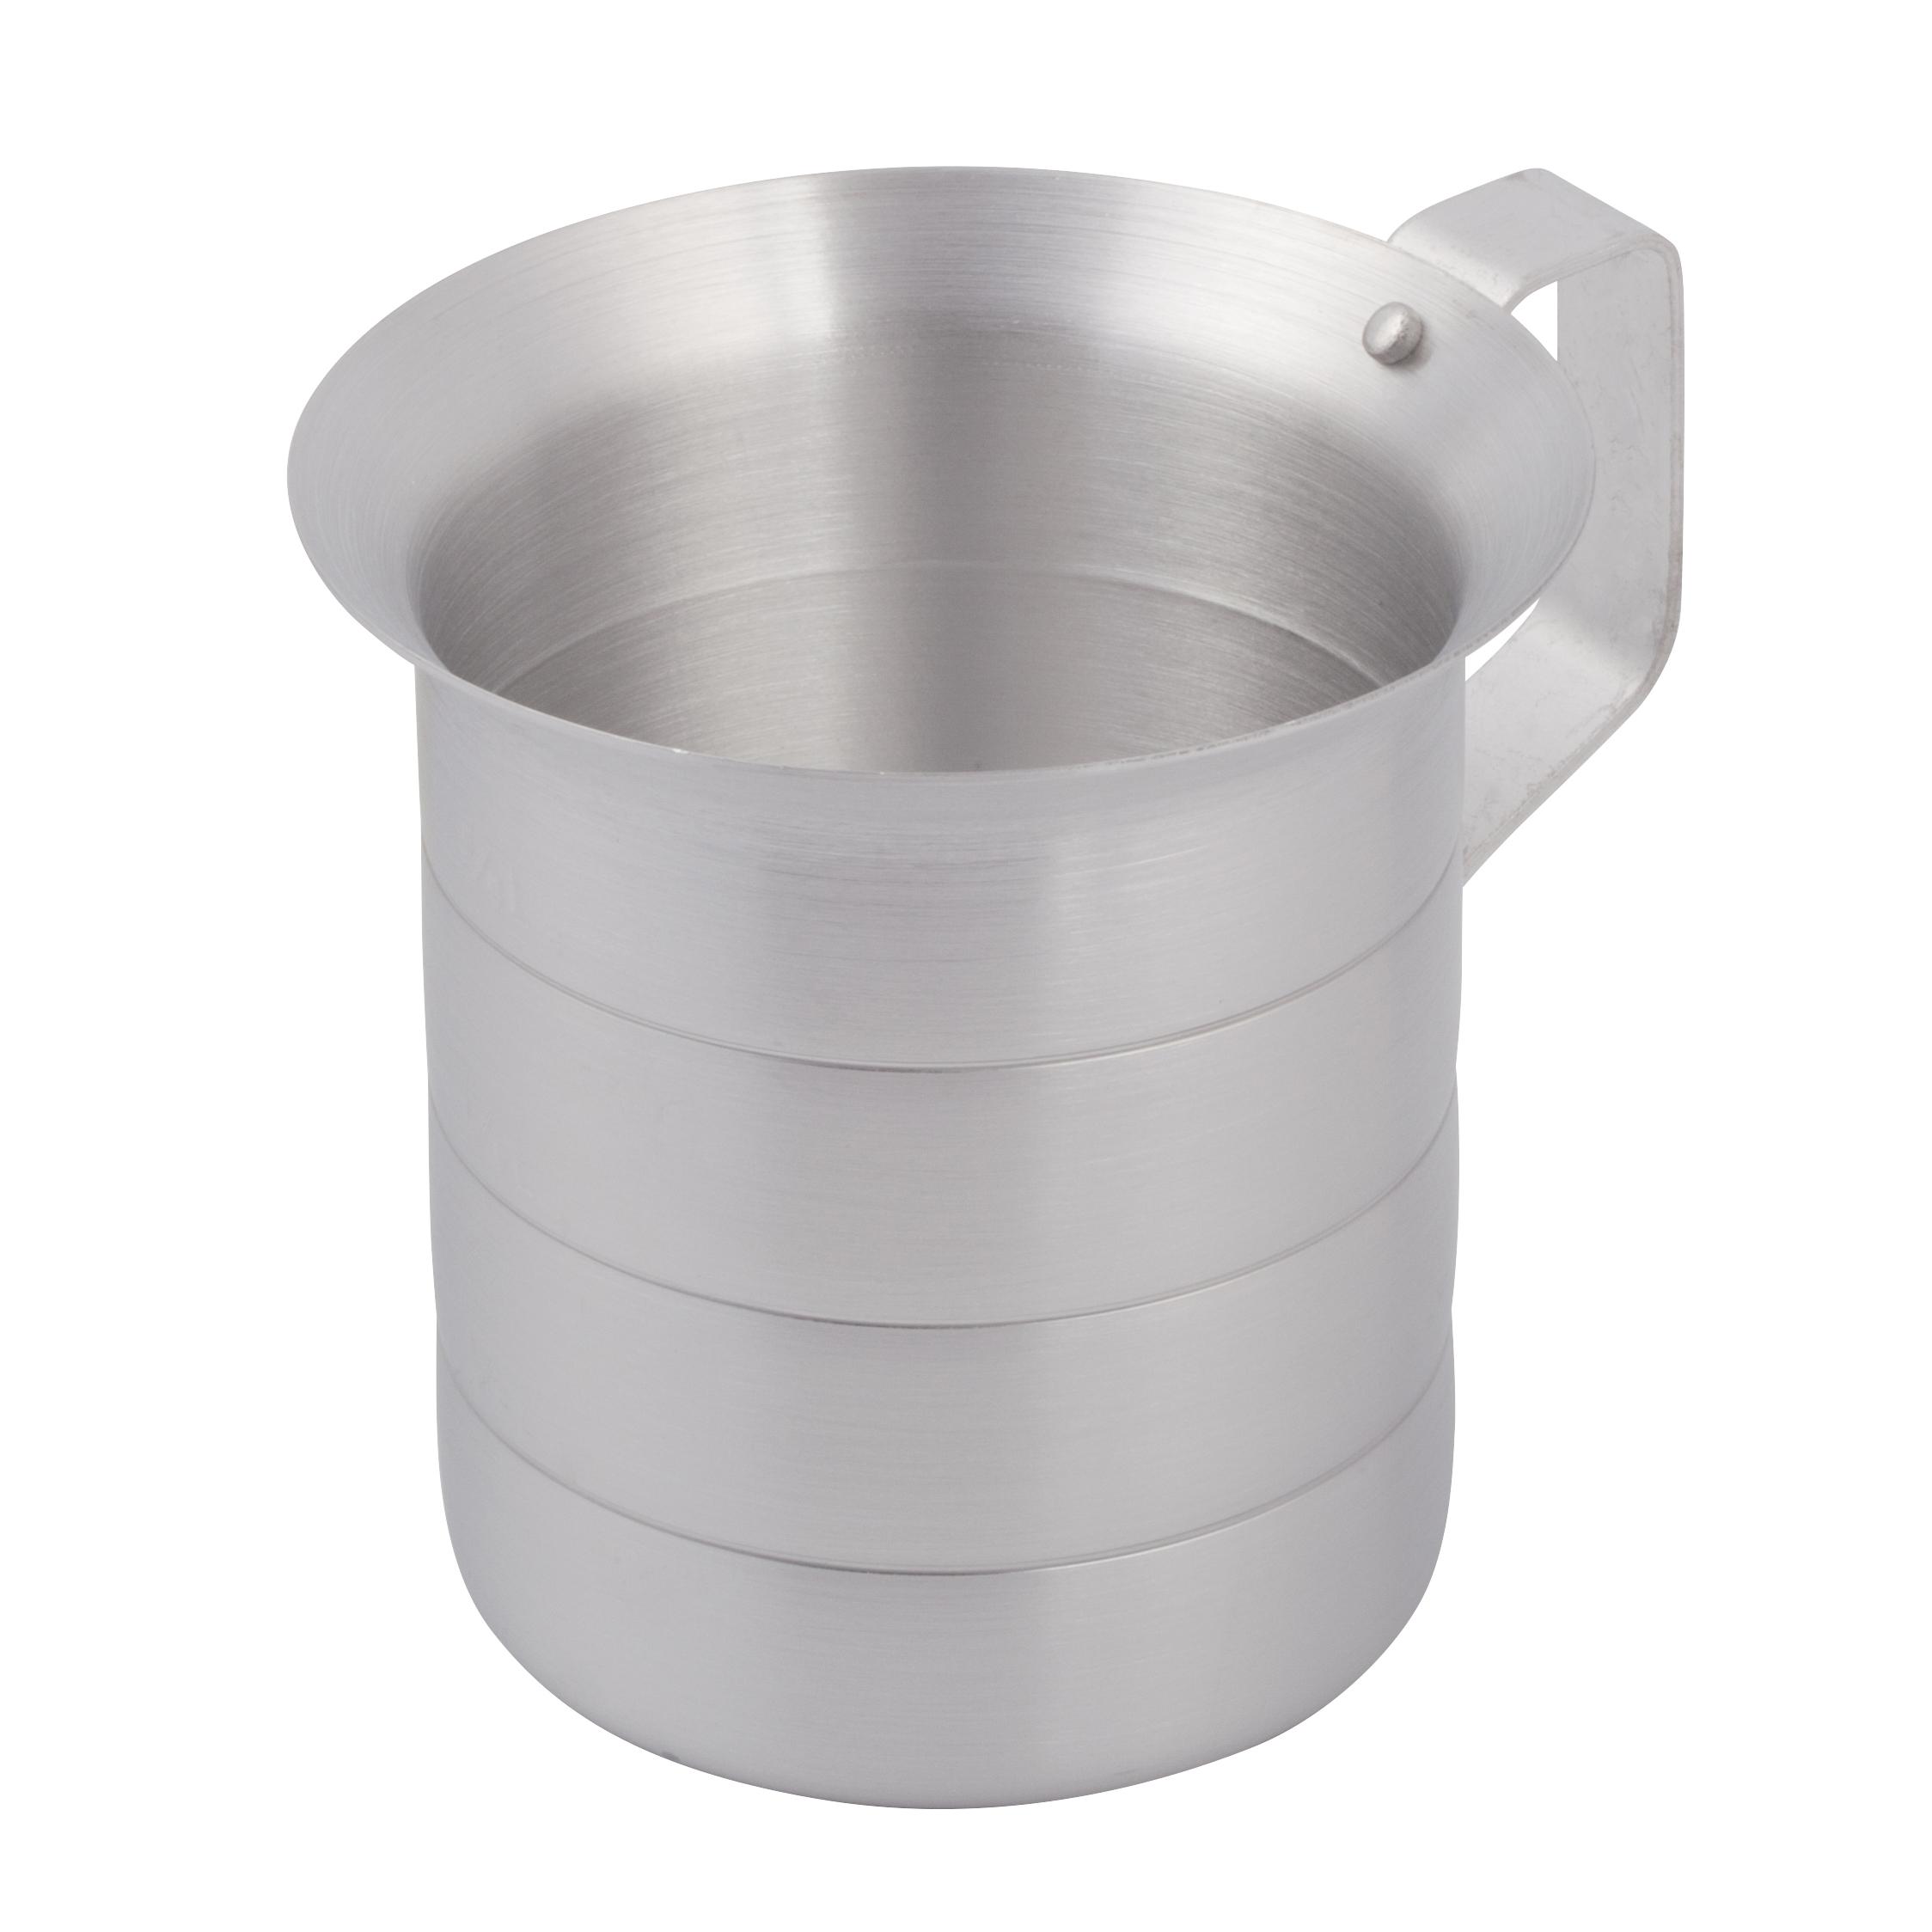 1750-11 Winco AM-1 measuring cups